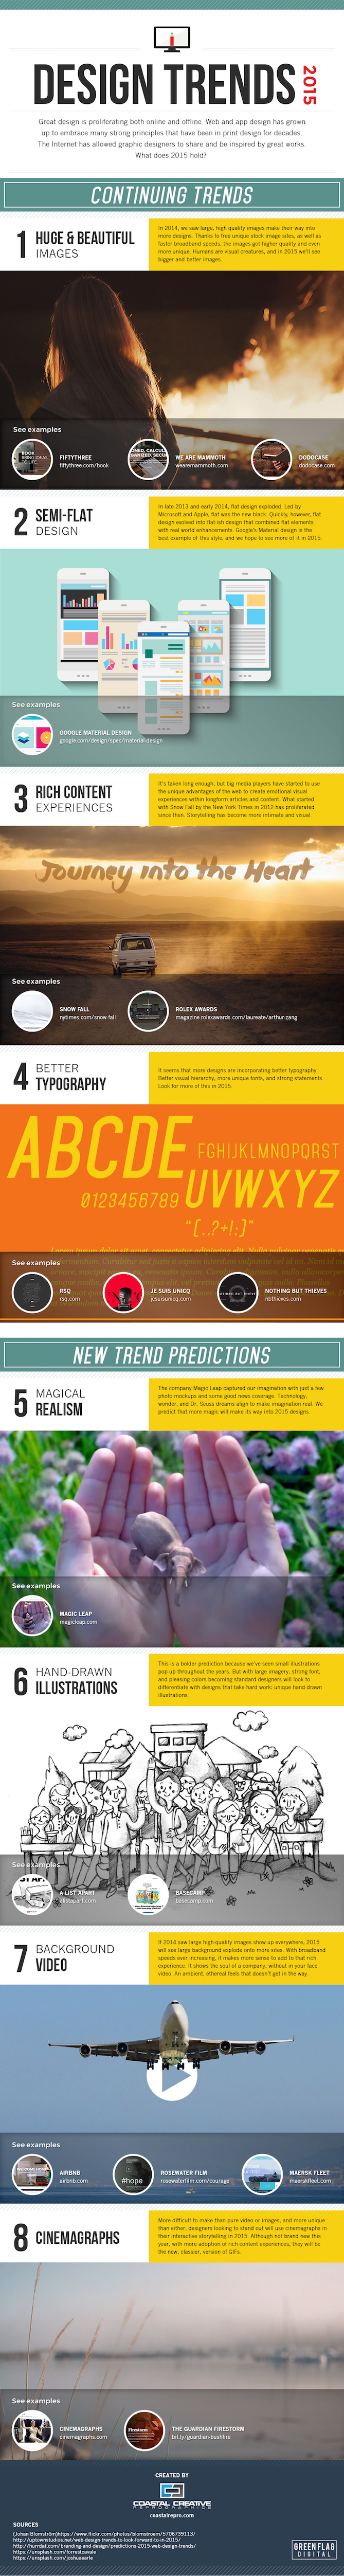 design-trends-2015-infographic